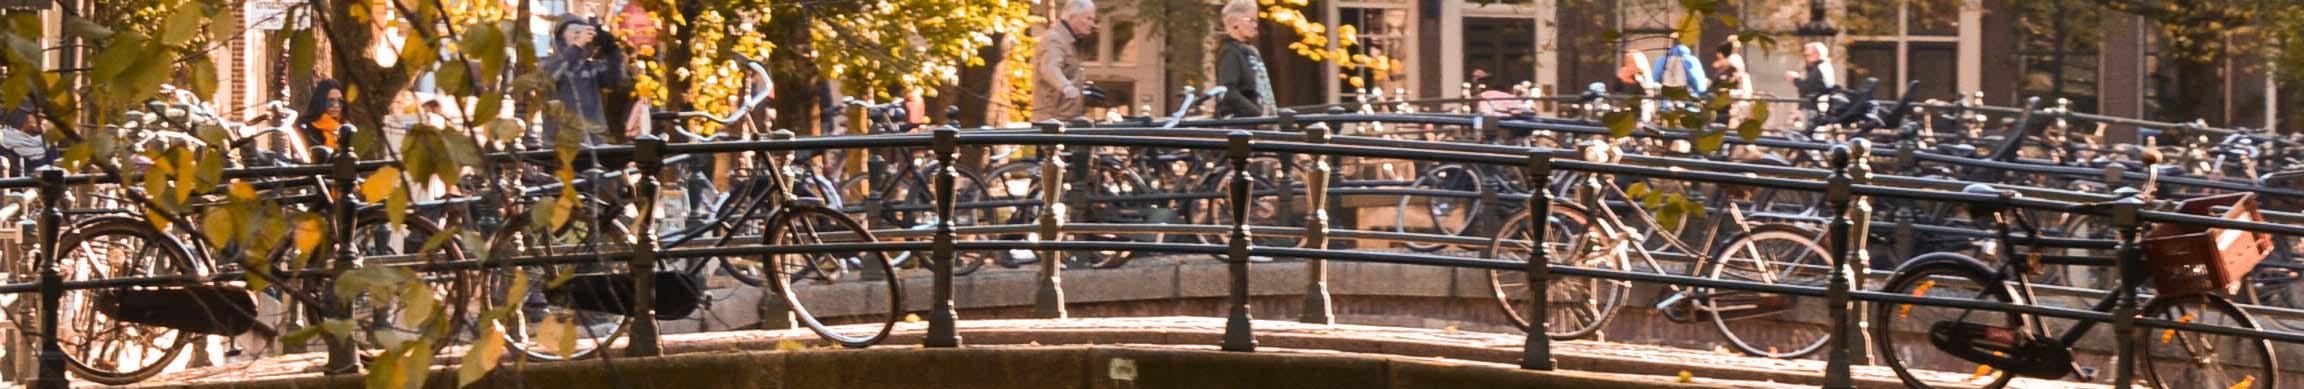 Amsterdam Claudia Lorusso Unsplash